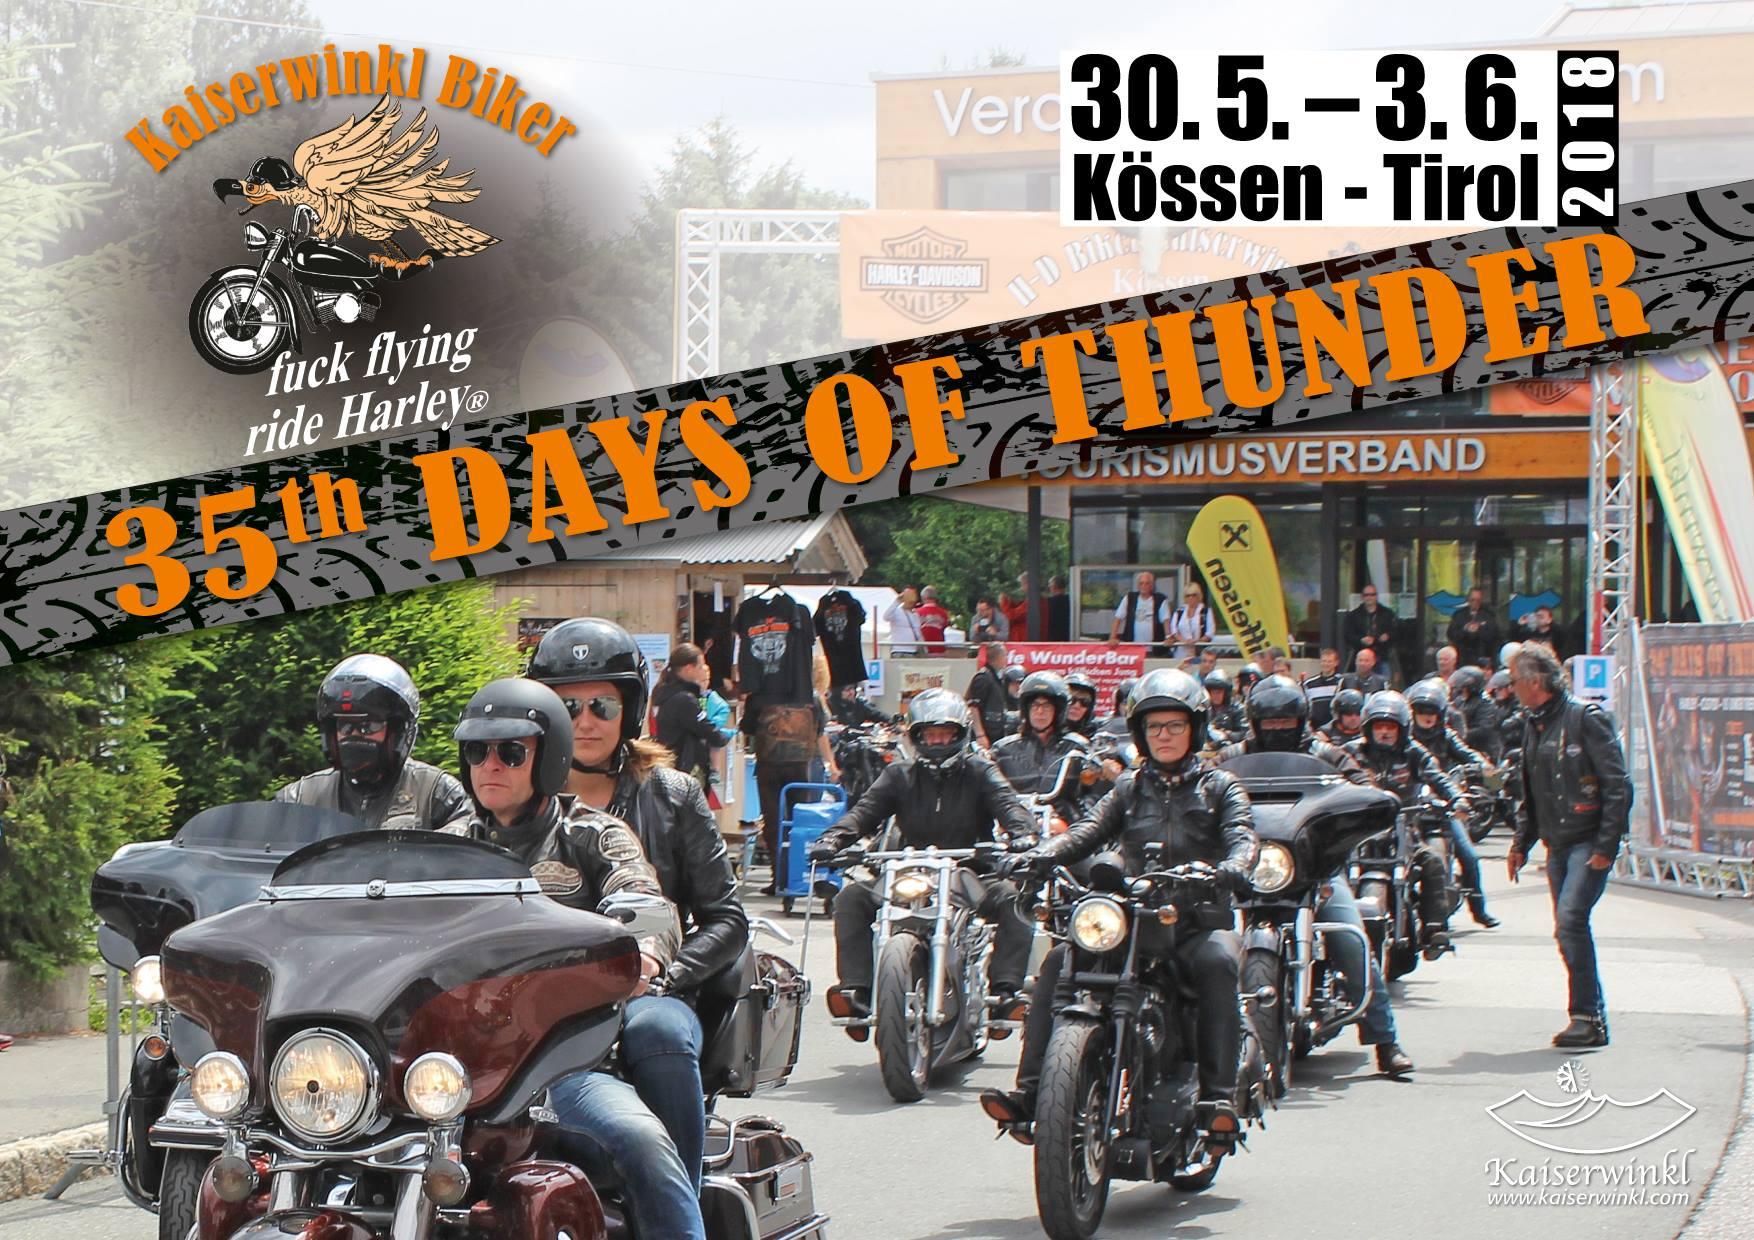 31. Harley Treffen in Kssen - Kitzbhel - zarell.com